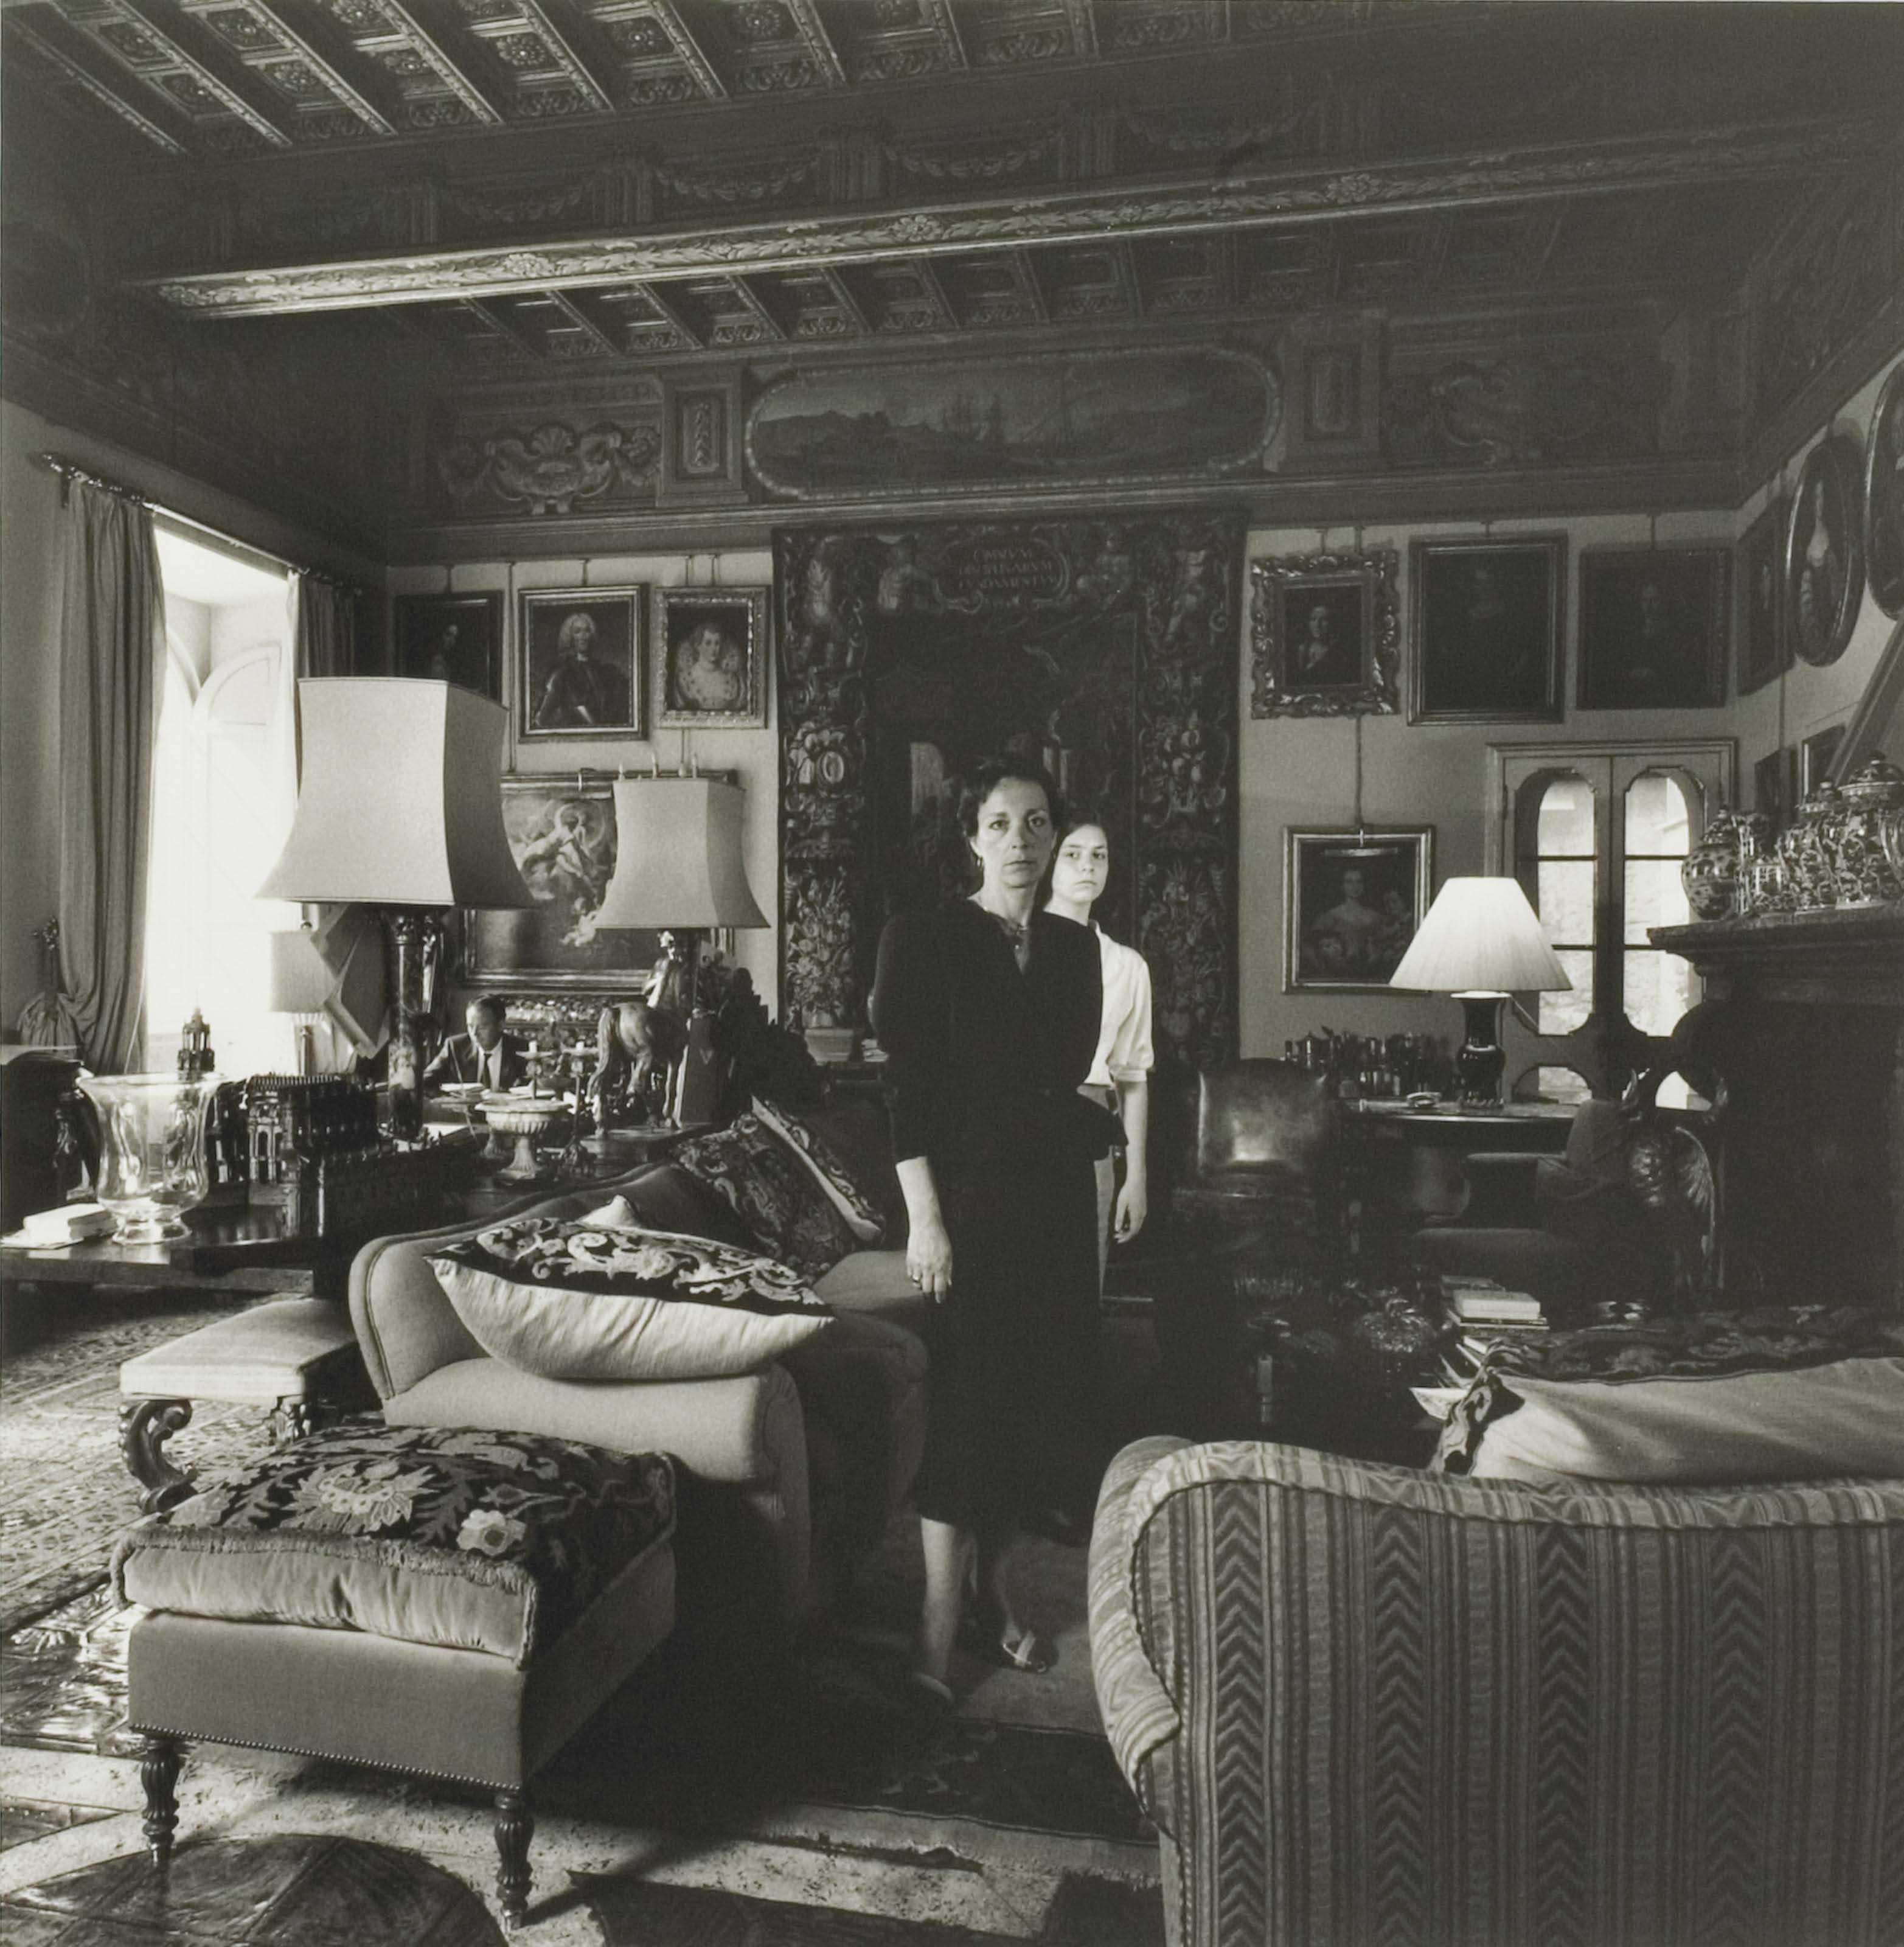 Famille Ricci, Rome, 1987